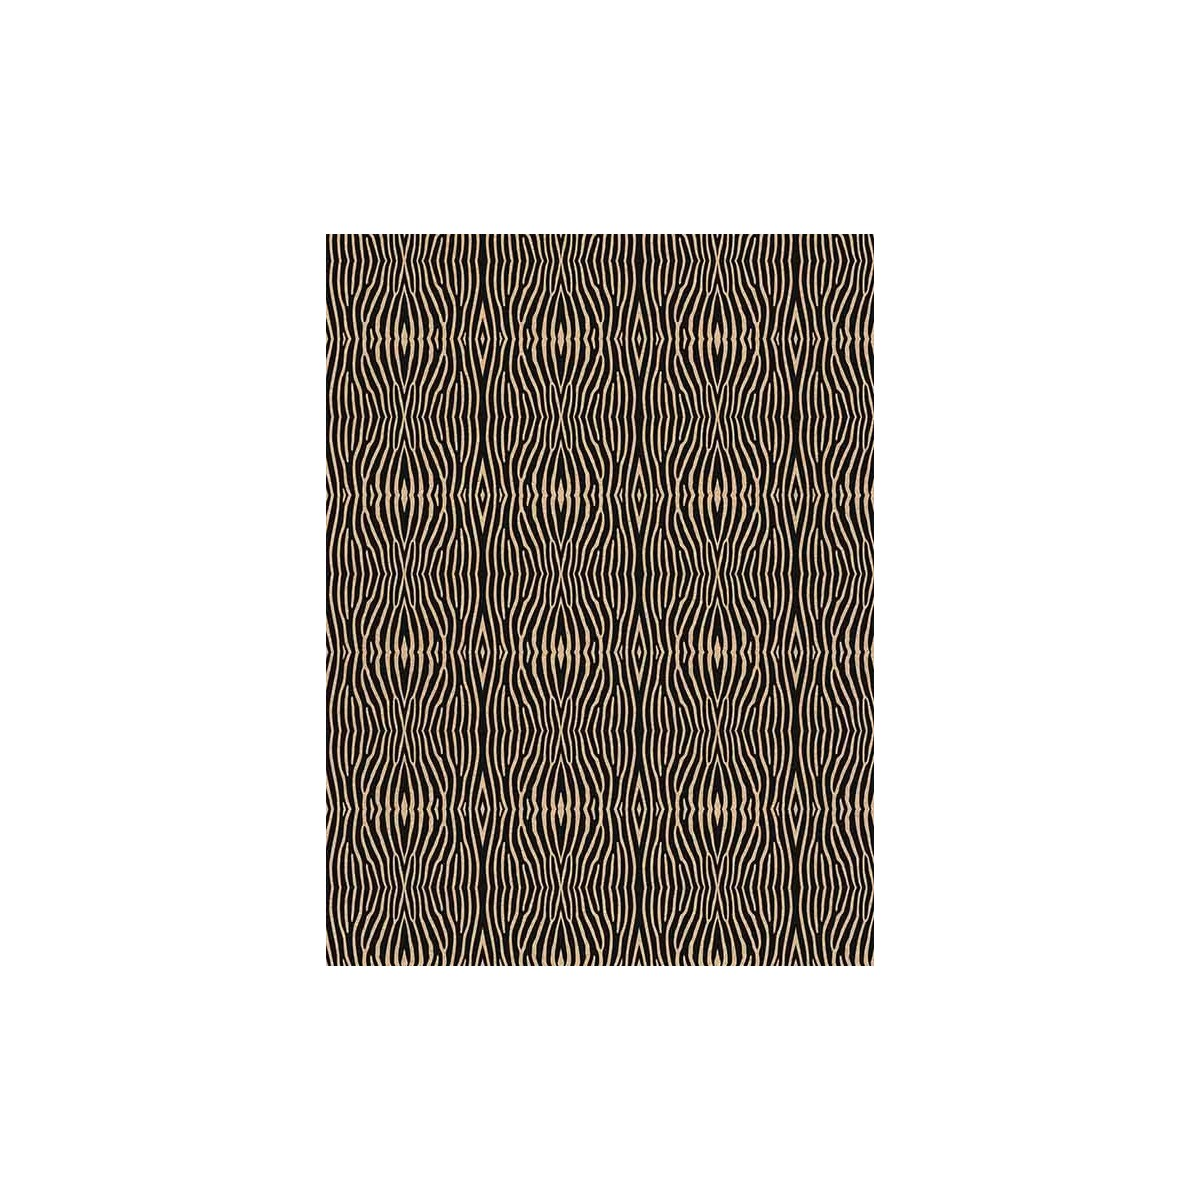 Cork fabric Technical Patterns - Zebra